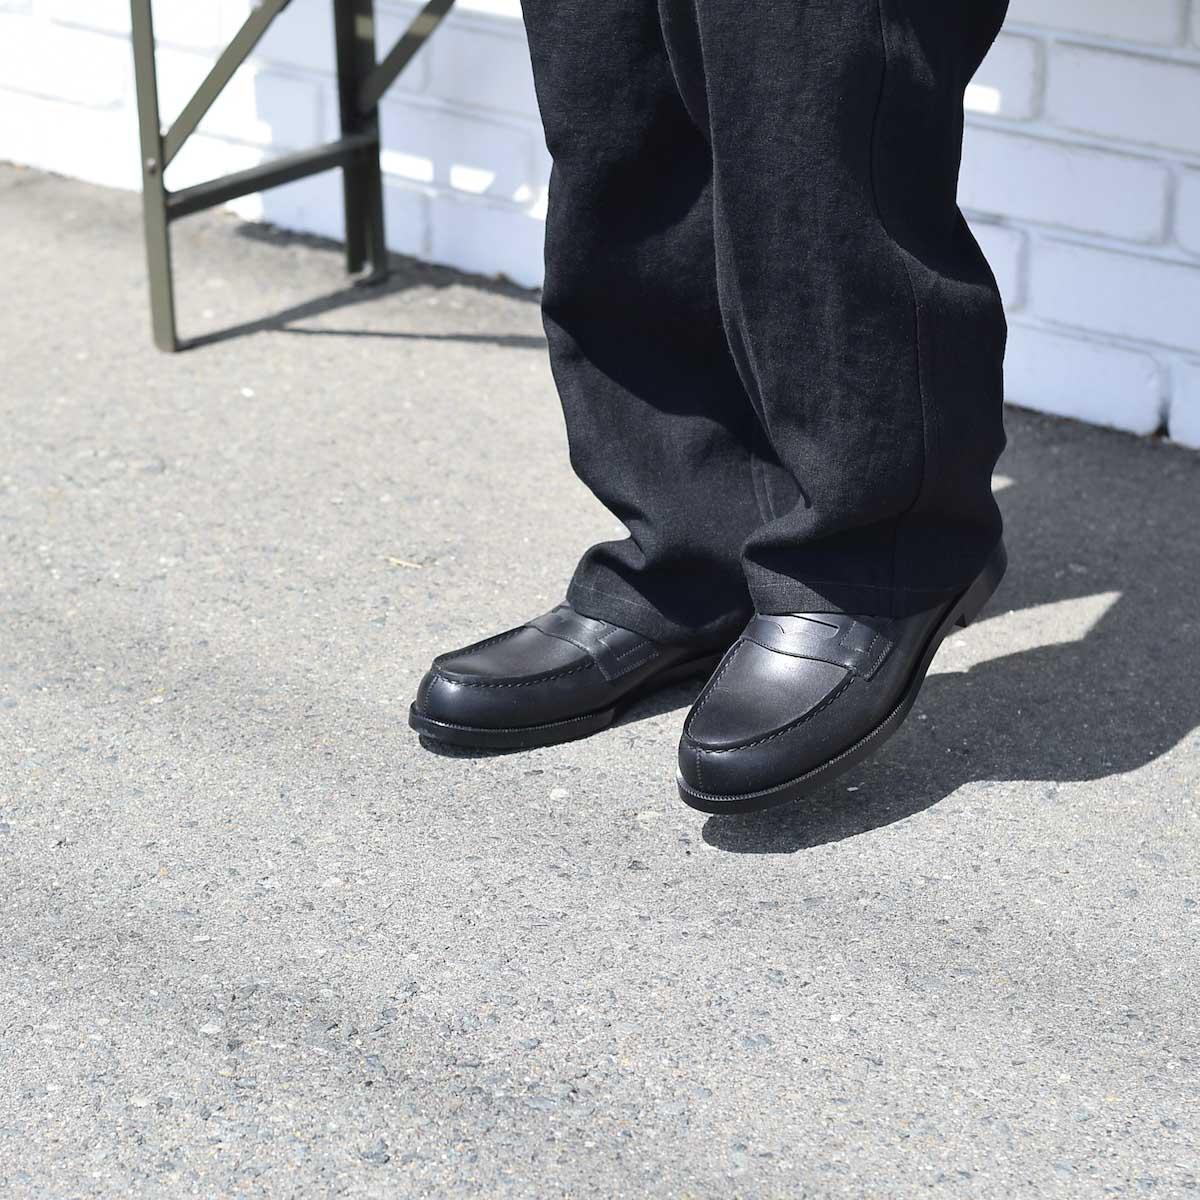 FOOTSTOCK ORIGINALS / LOAFER (Black)着用イメージ